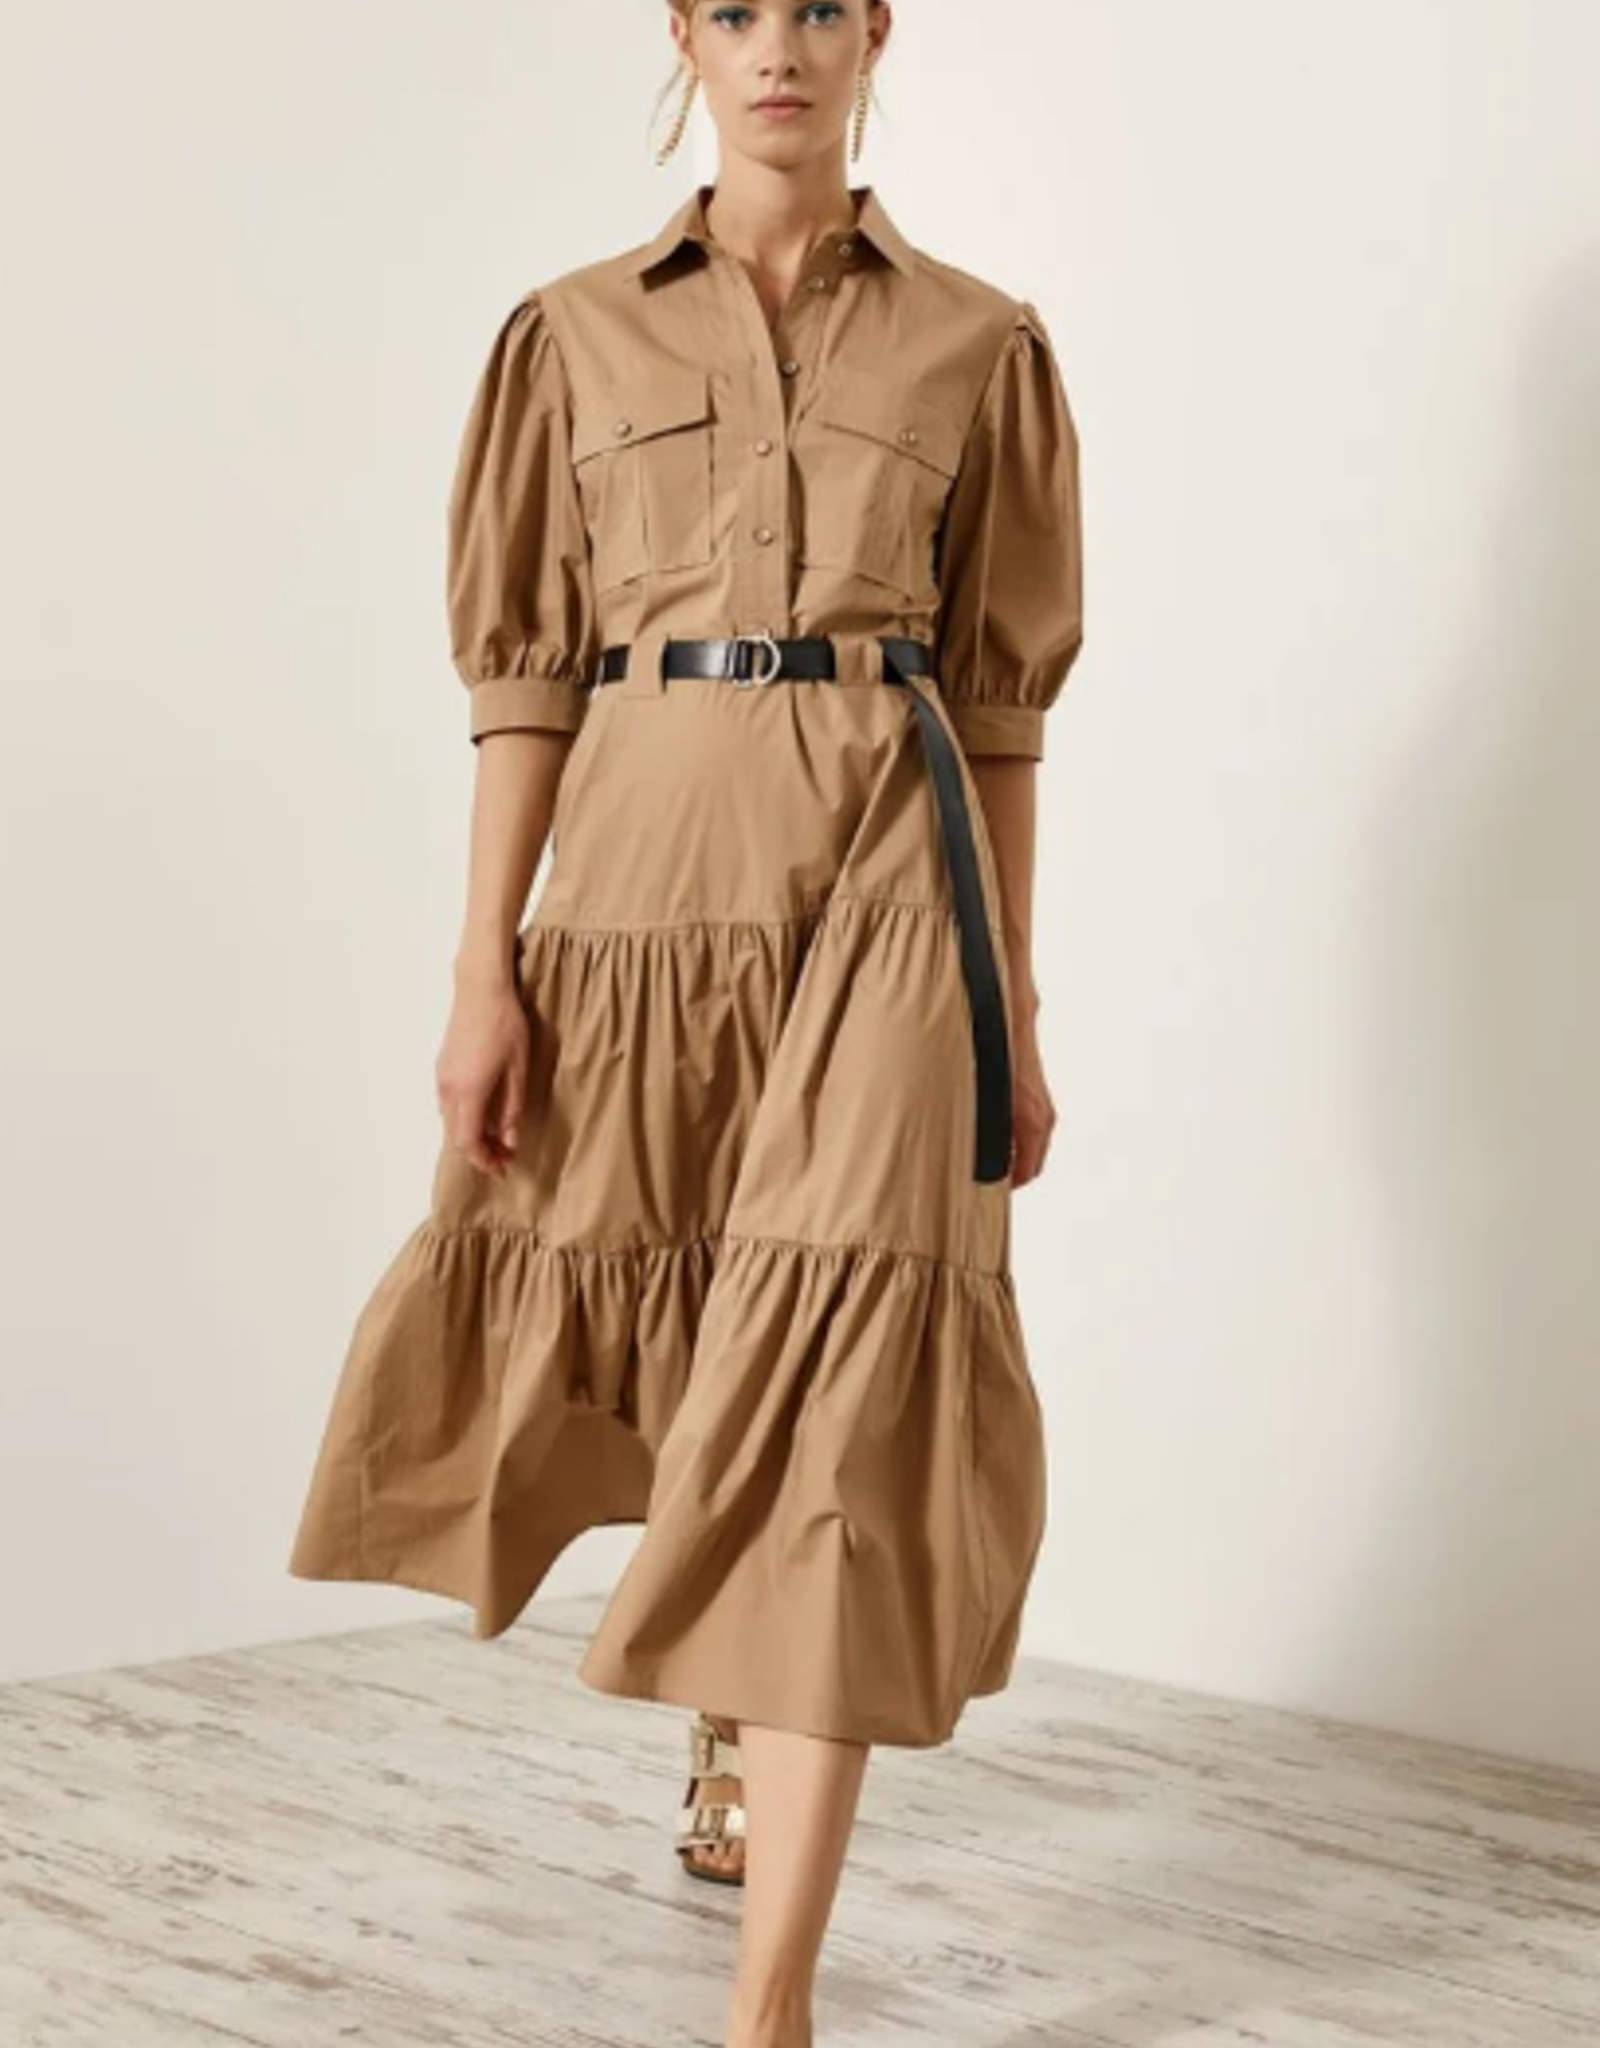 Dames Fashion Beige lange jurk met riem